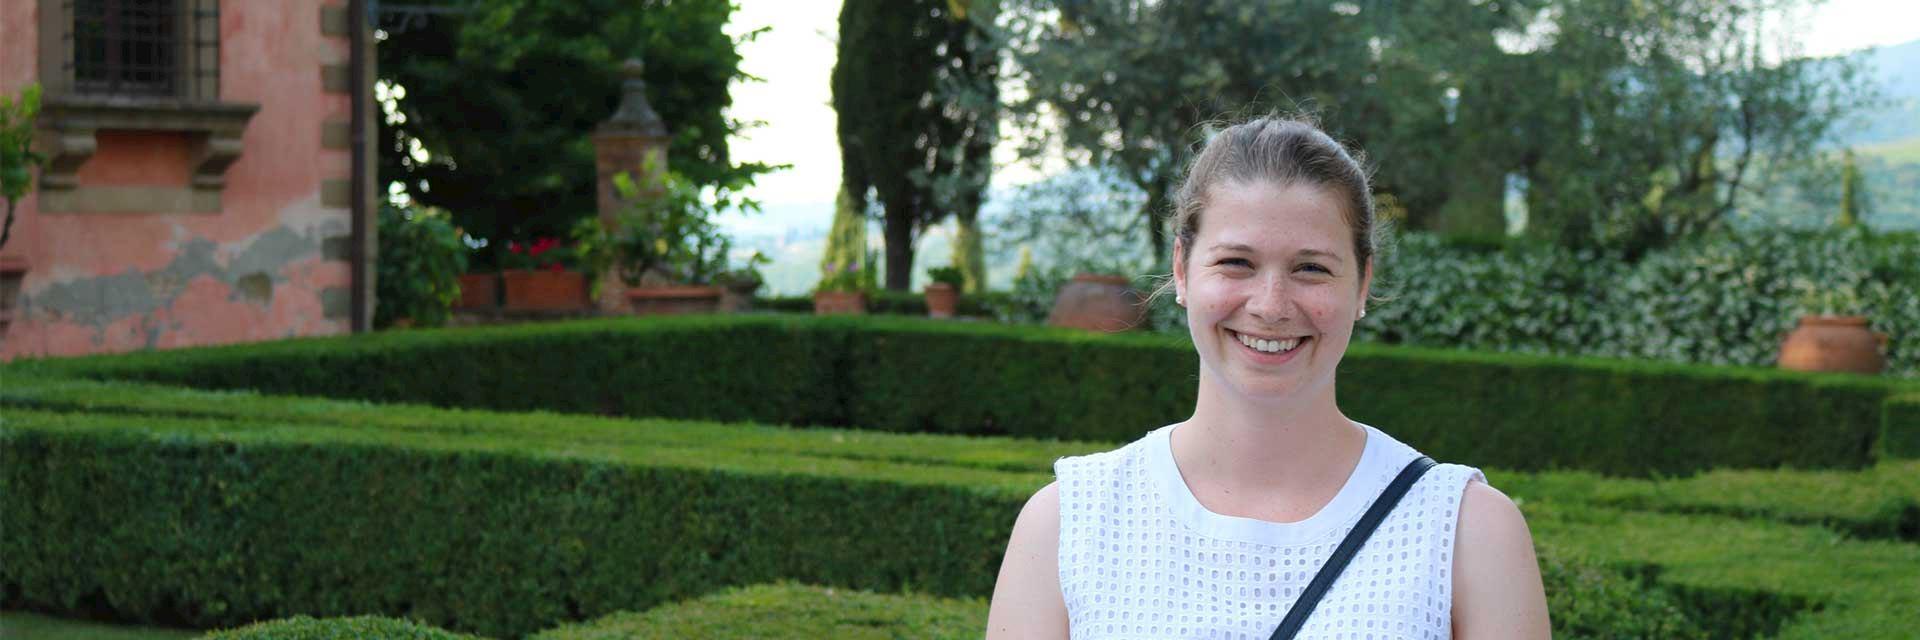 Julia at Vignamaggio Gardens